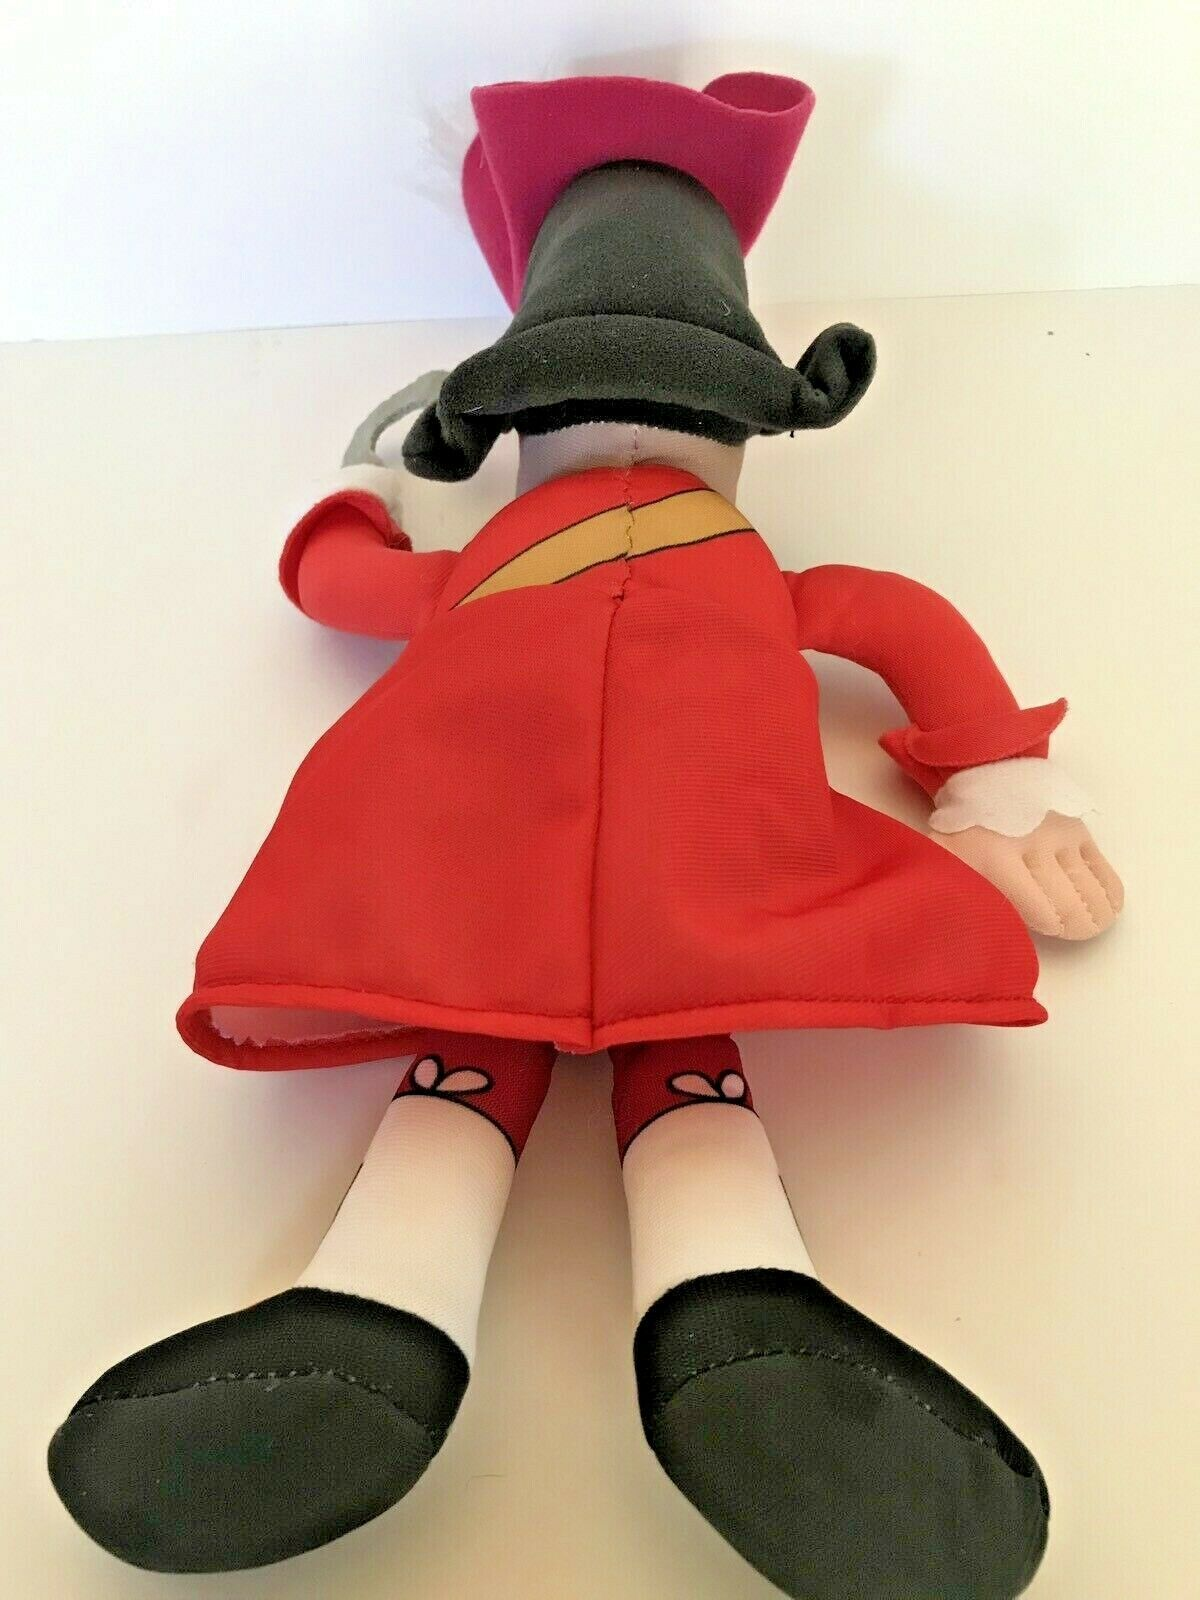 Disney Captain Hook Talking plush doll Jake Neverland Pirates Fisher Price 2011